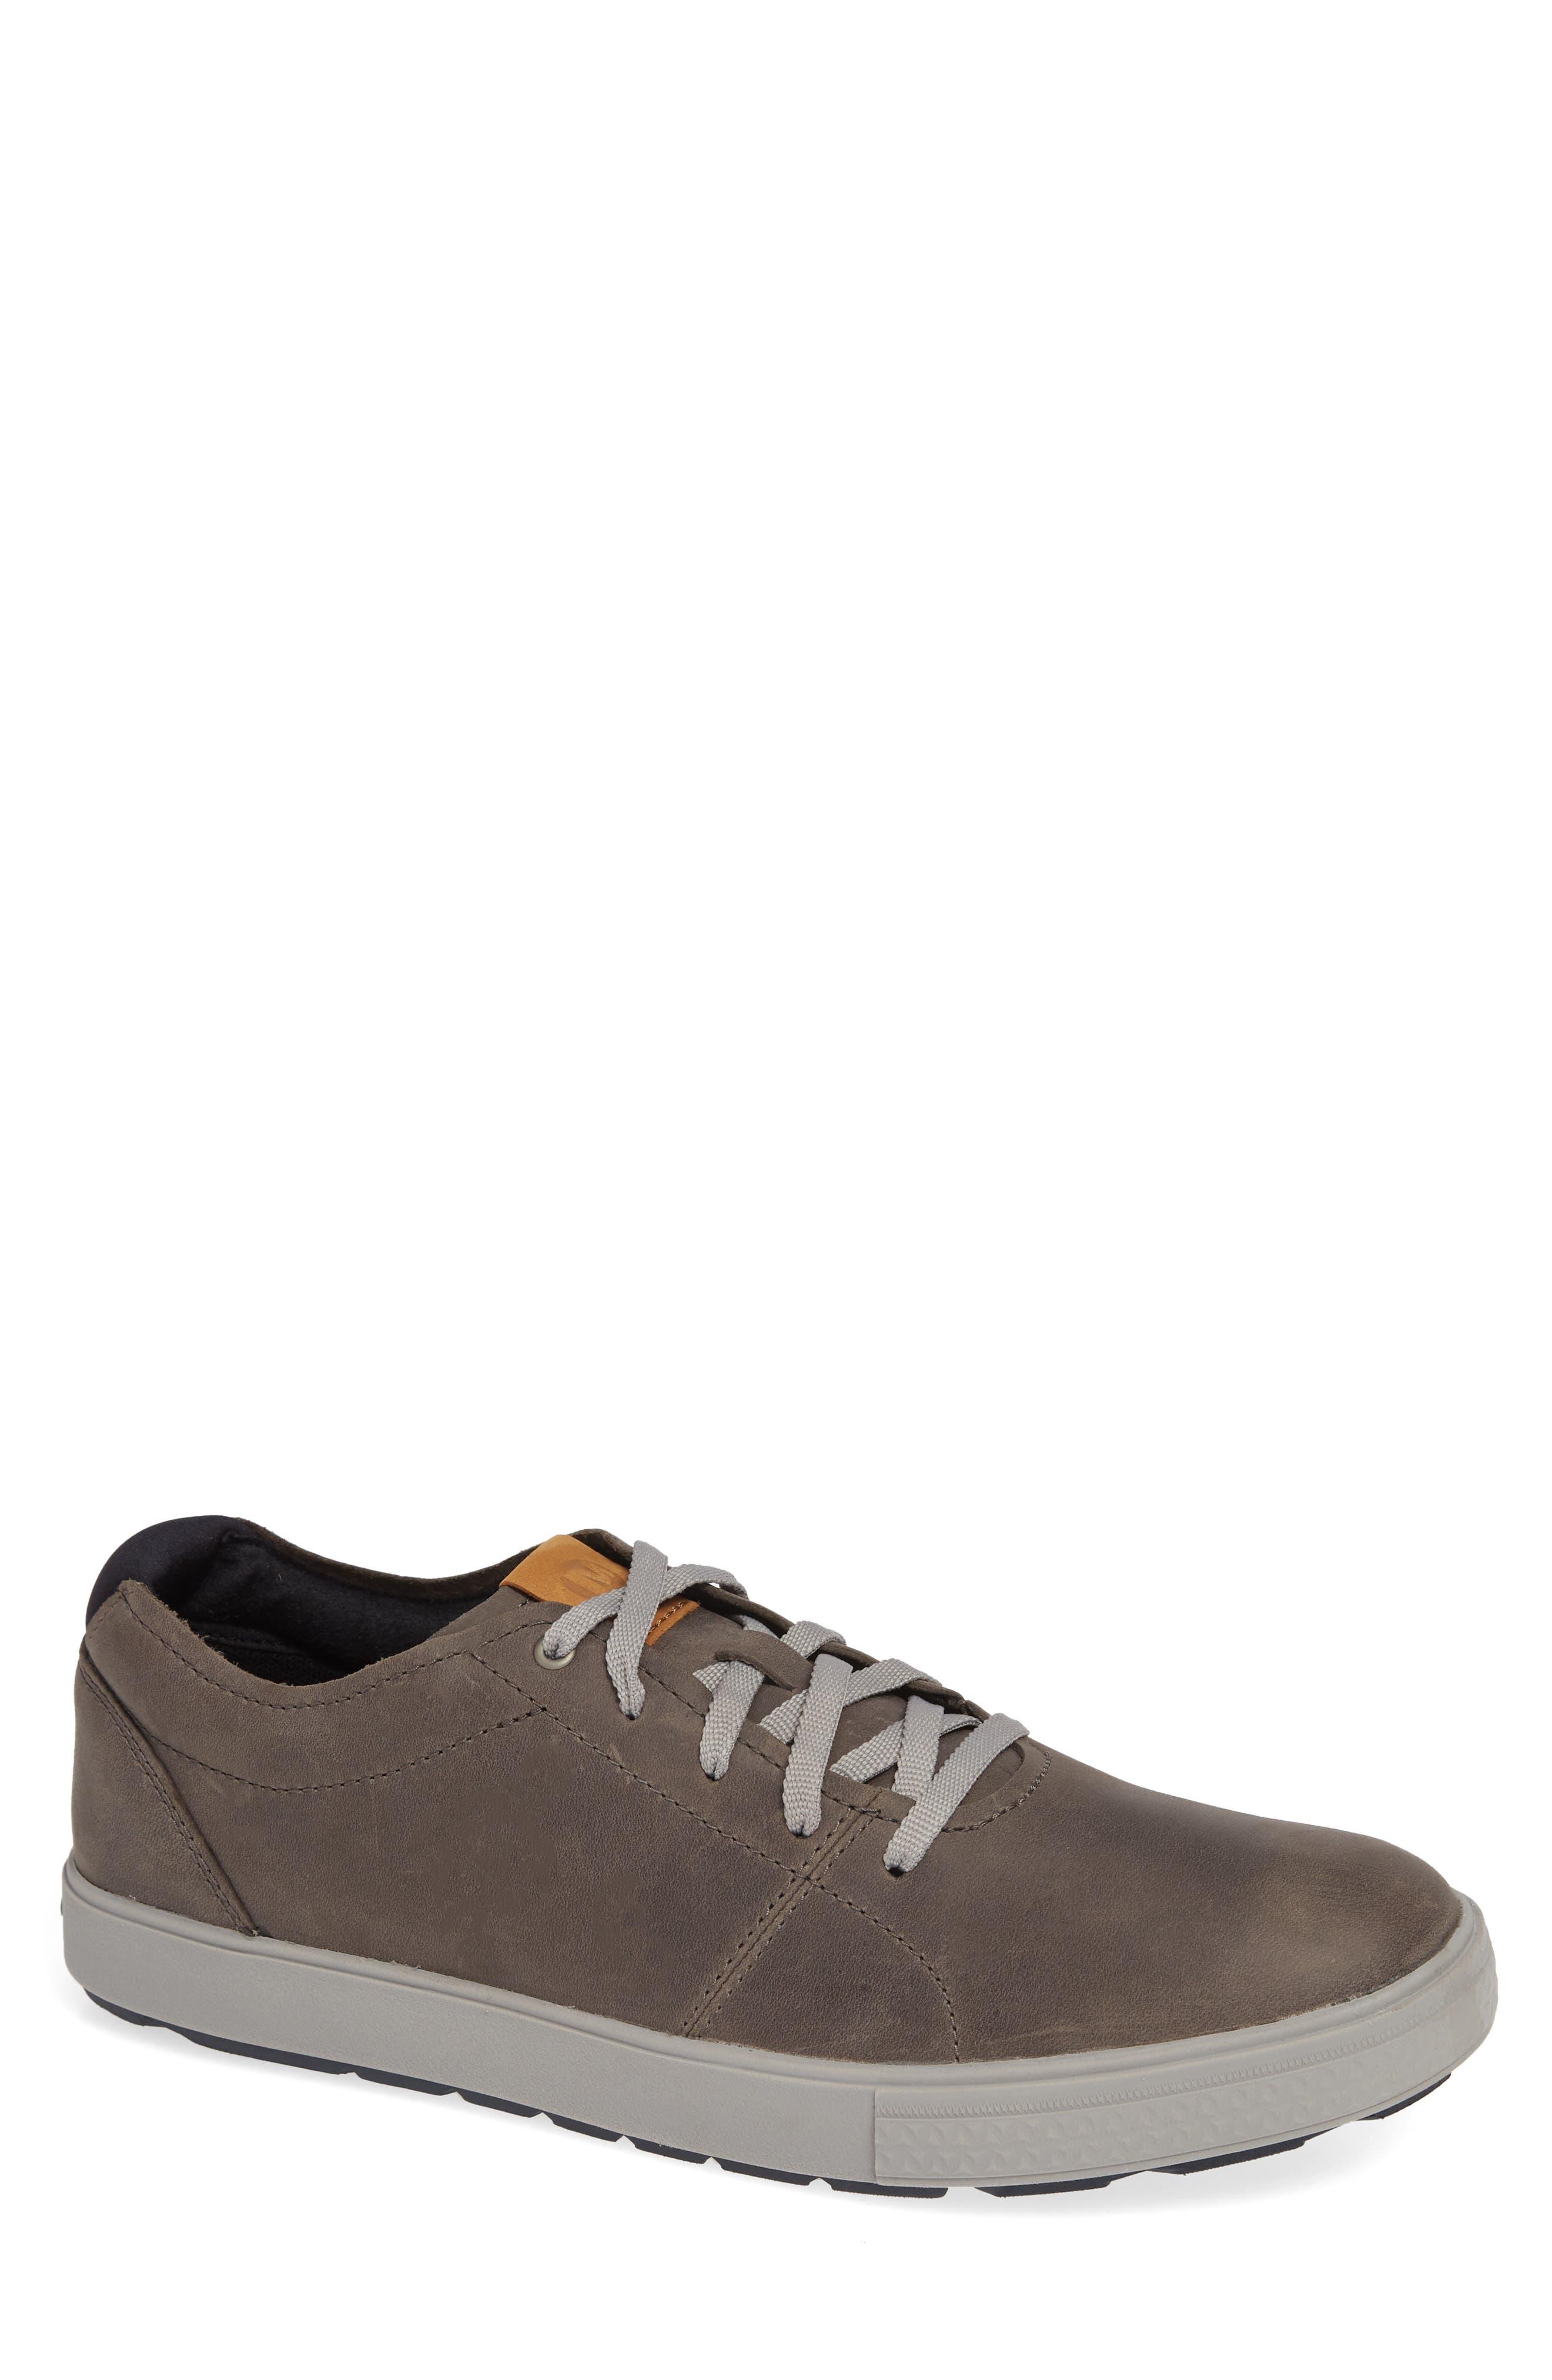 MERRELL, Barkley Sneaker, Main thumbnail 1, color, CASTLE ROCK